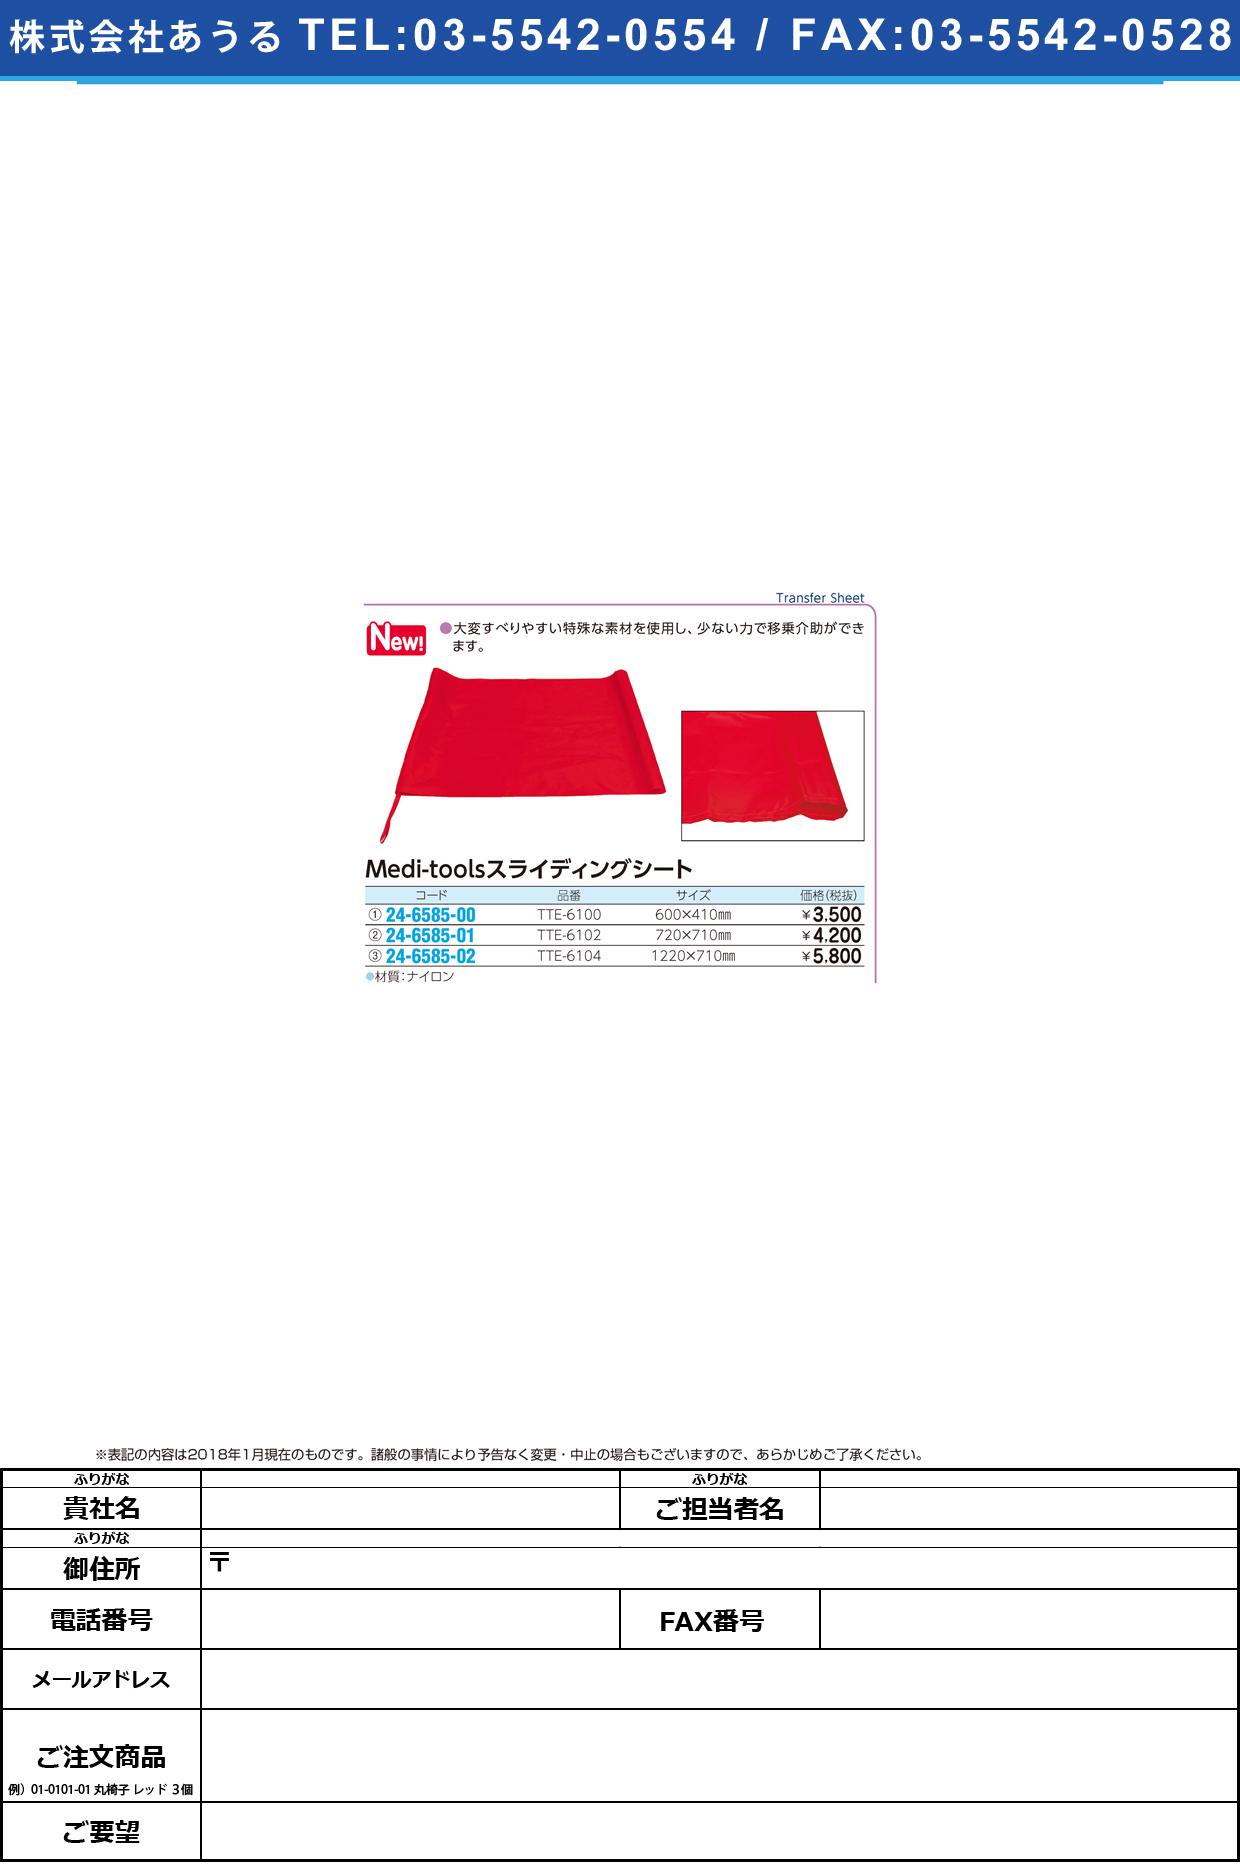 (24-6585-02)Meditoolスライディングシート TTE-6104(1220X710) メディツールスライディングシート(日本エンゼル)【1枚単位】【2018年カタログ商品】